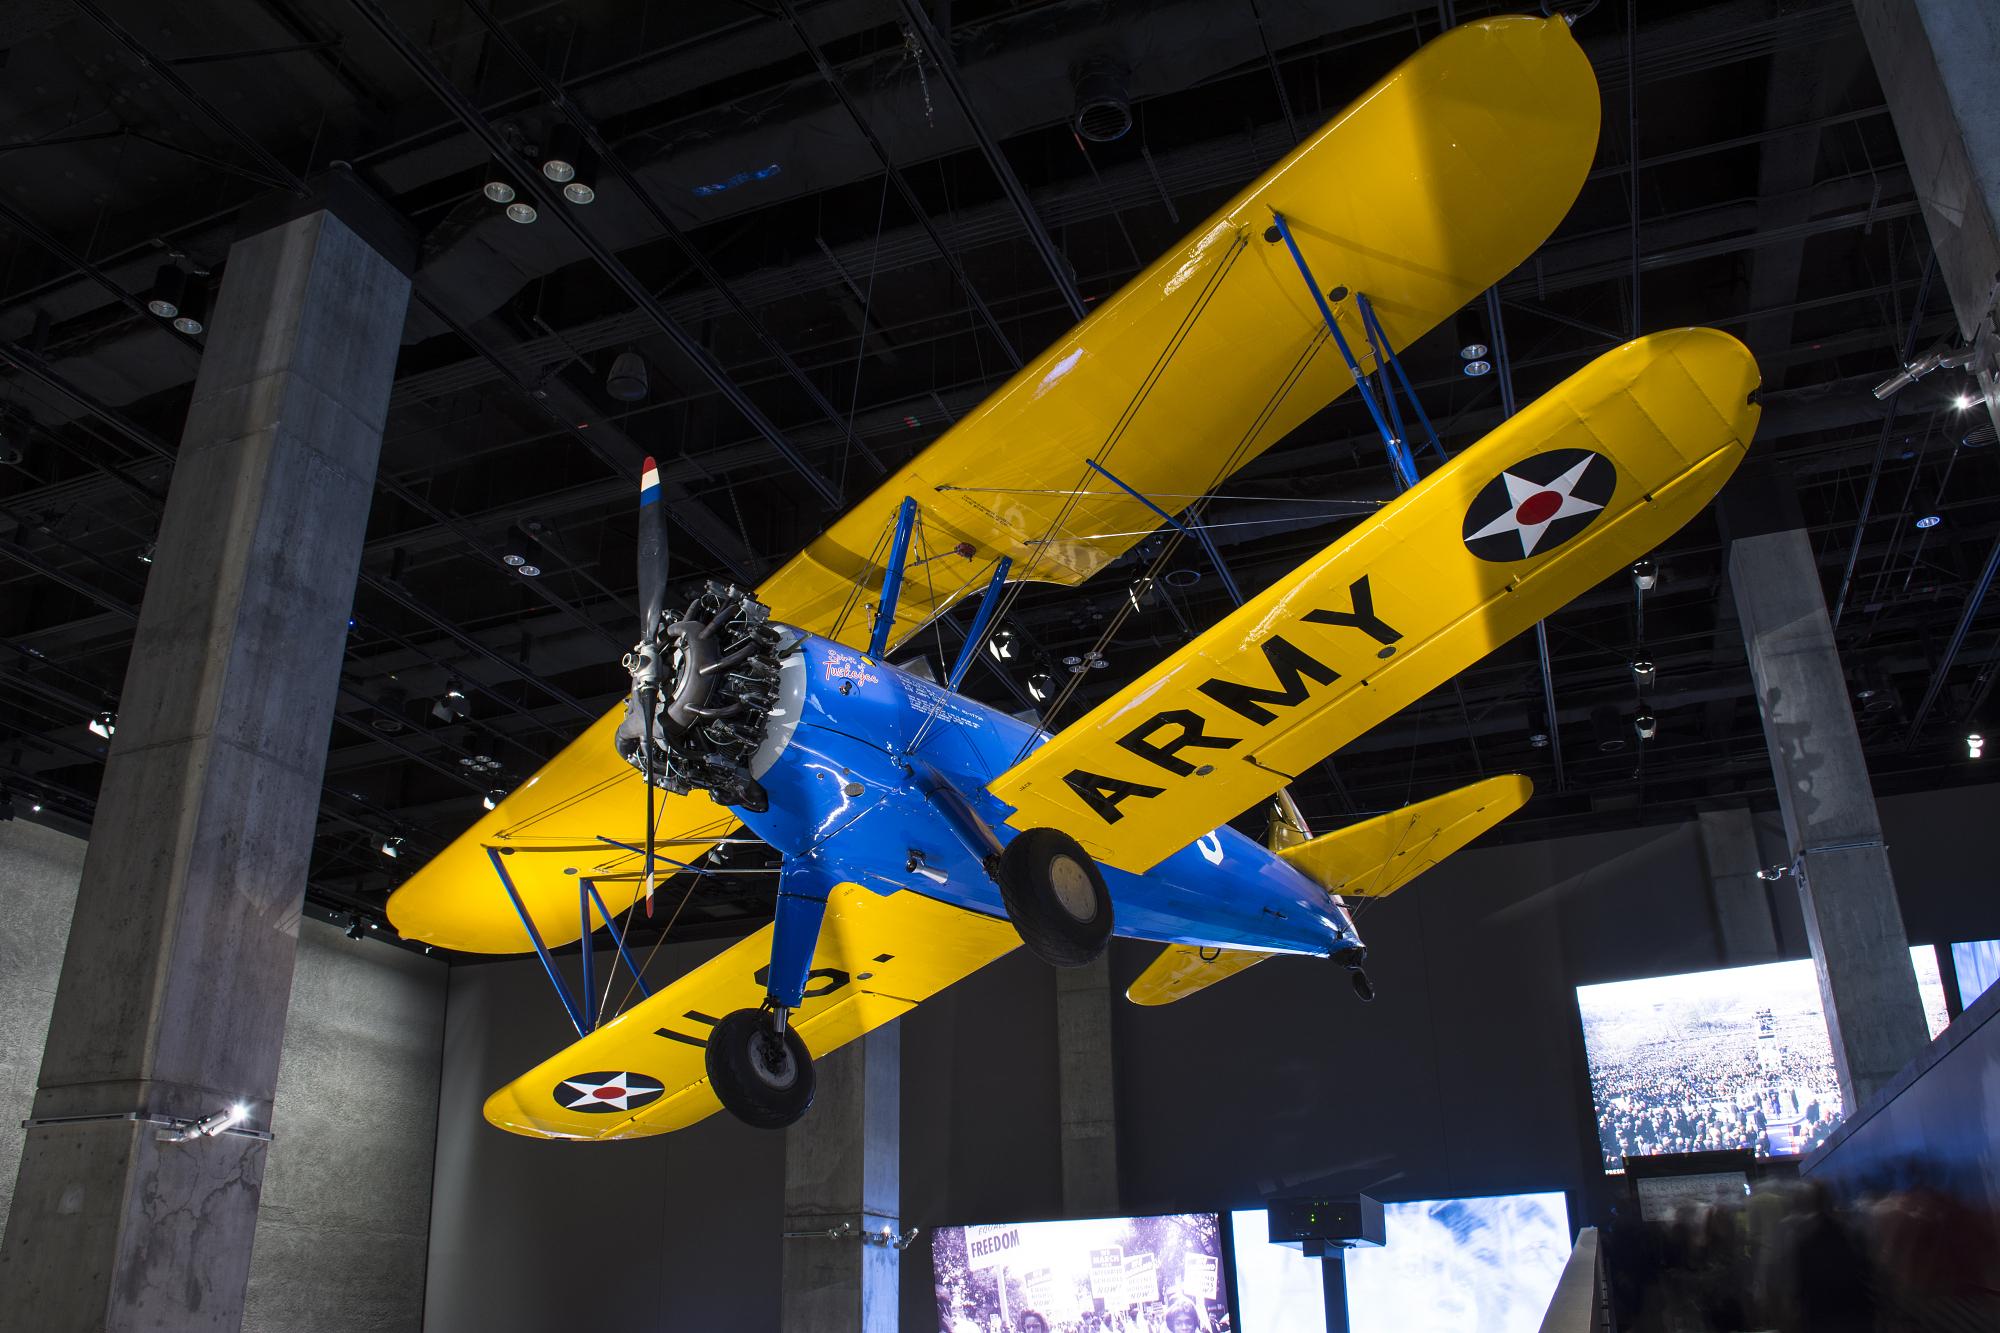 Installation of Tuskegee Training Biplane, NMAAHC